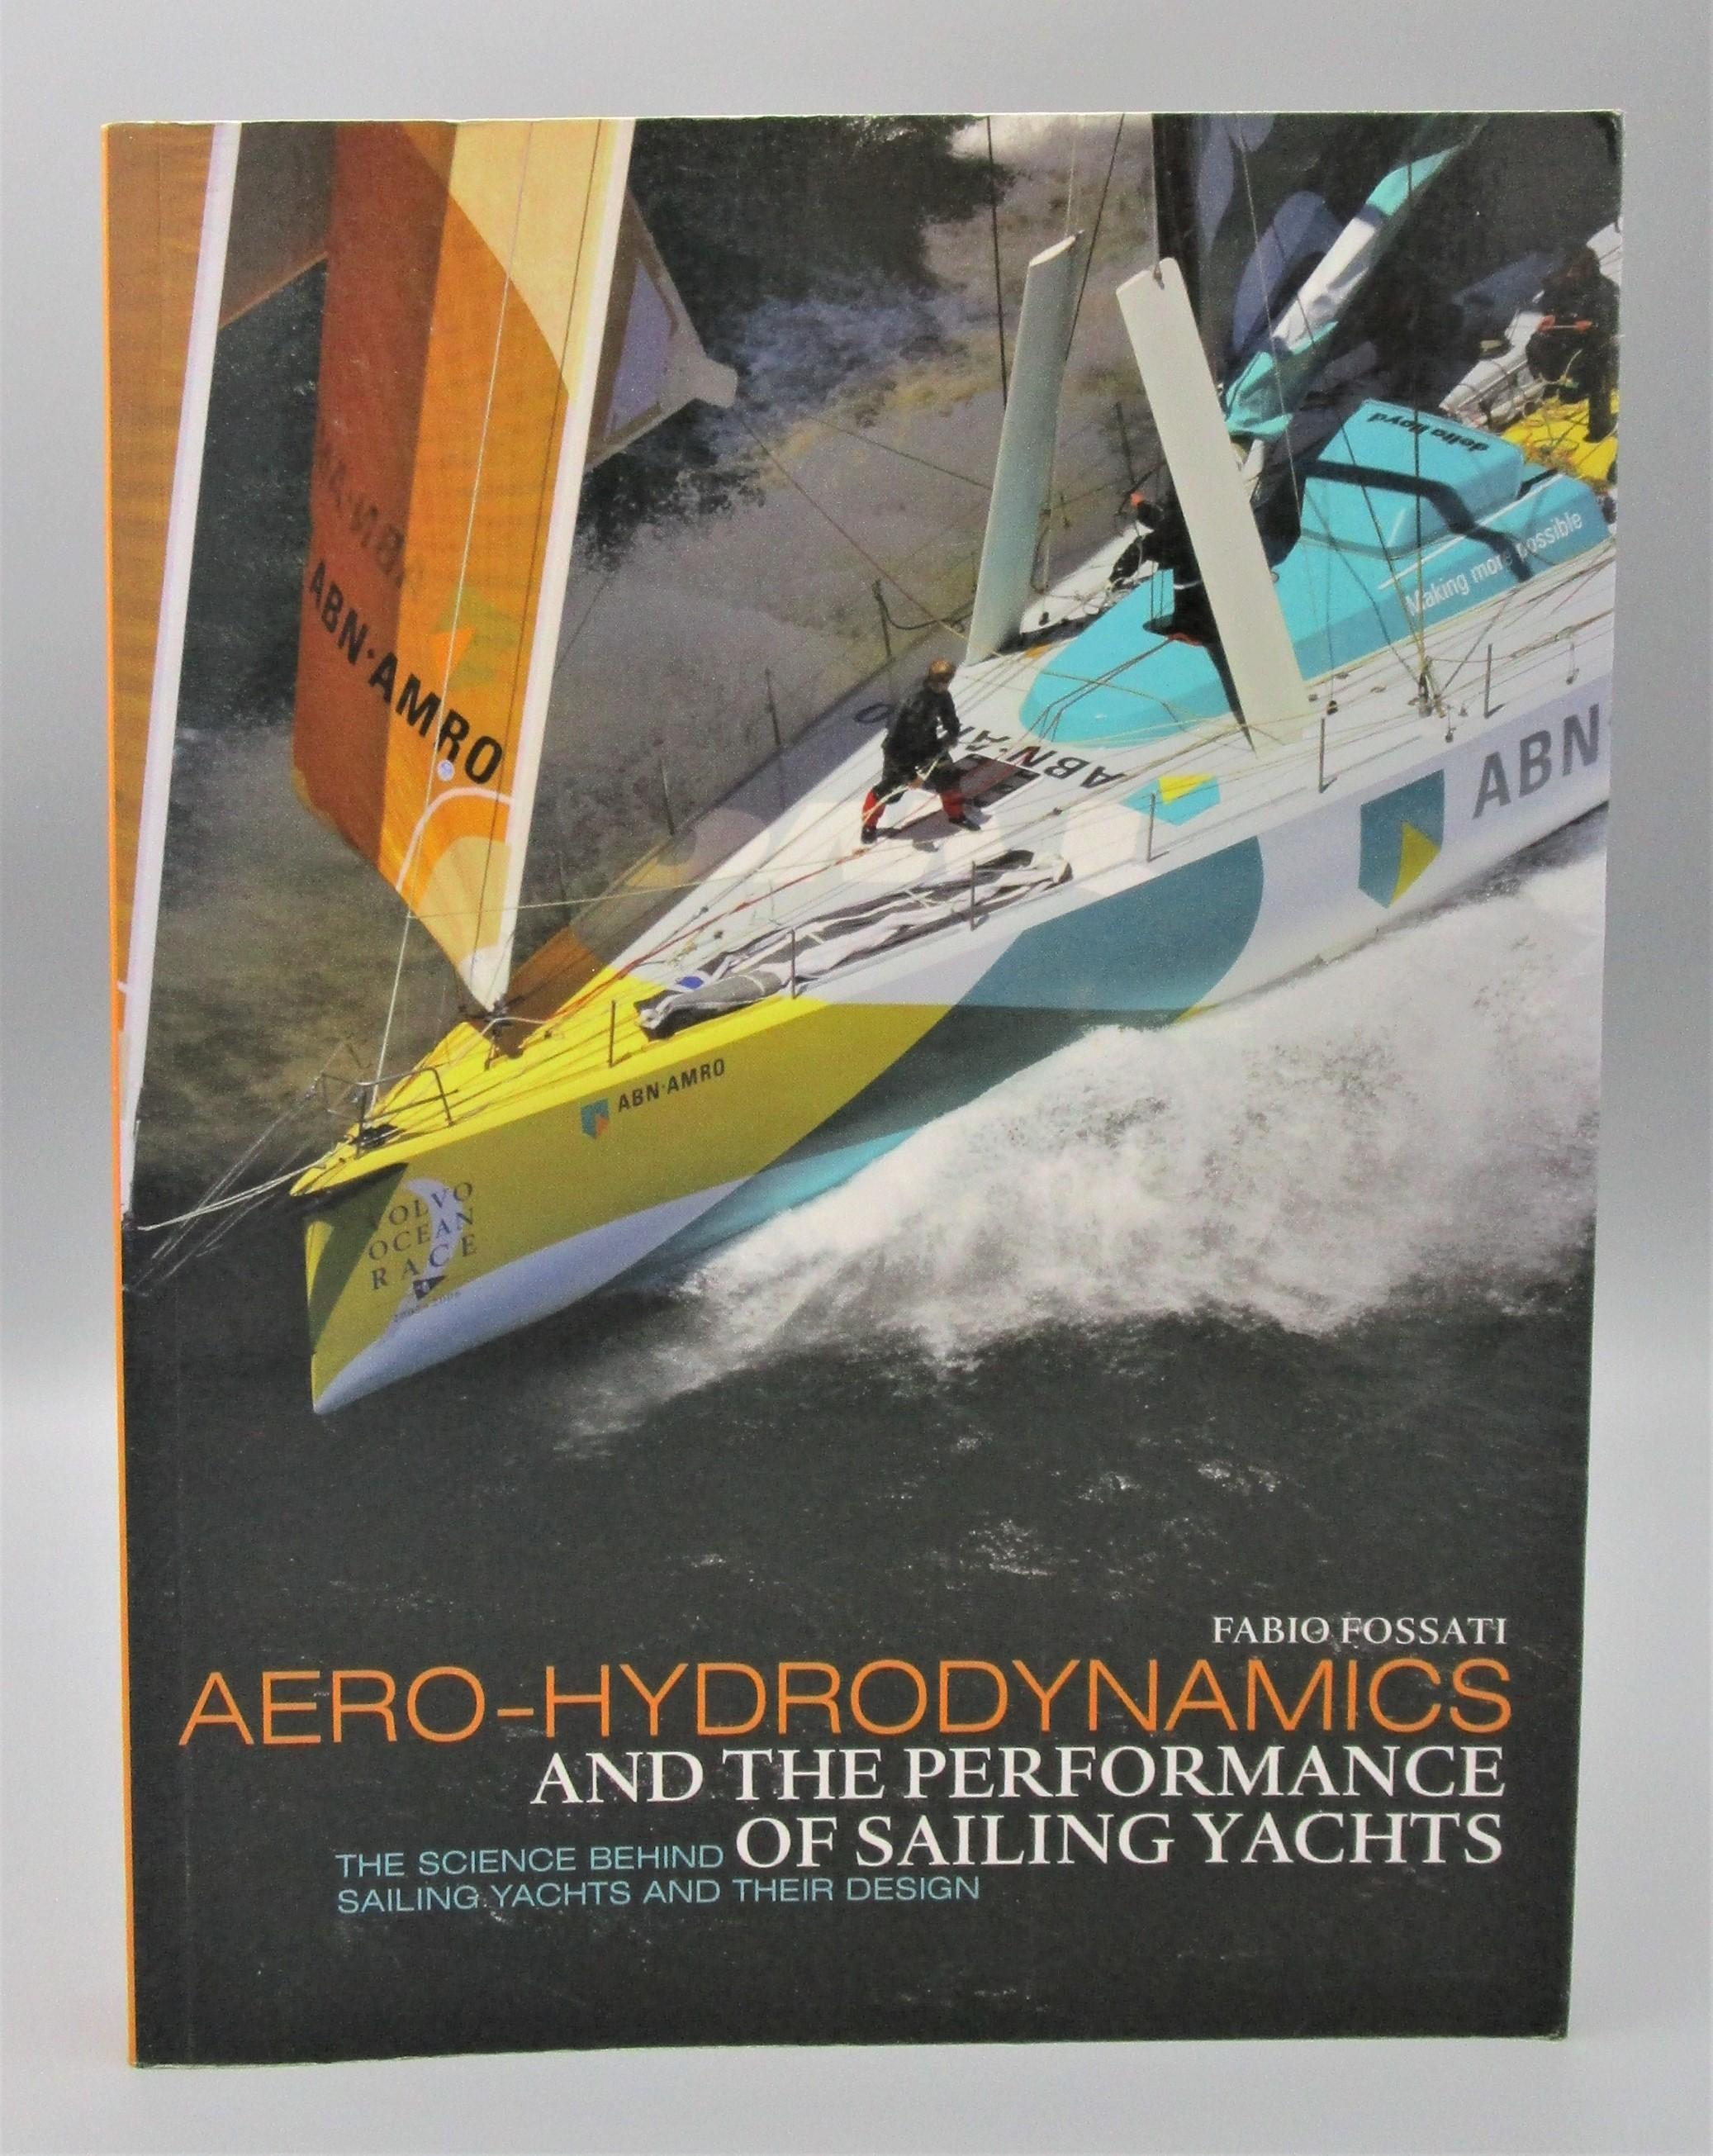 AERO-HYDRODYNAMICS & THE PERFORMANCE OF SAILING YACHTS, by Fabio Fossati - 2009